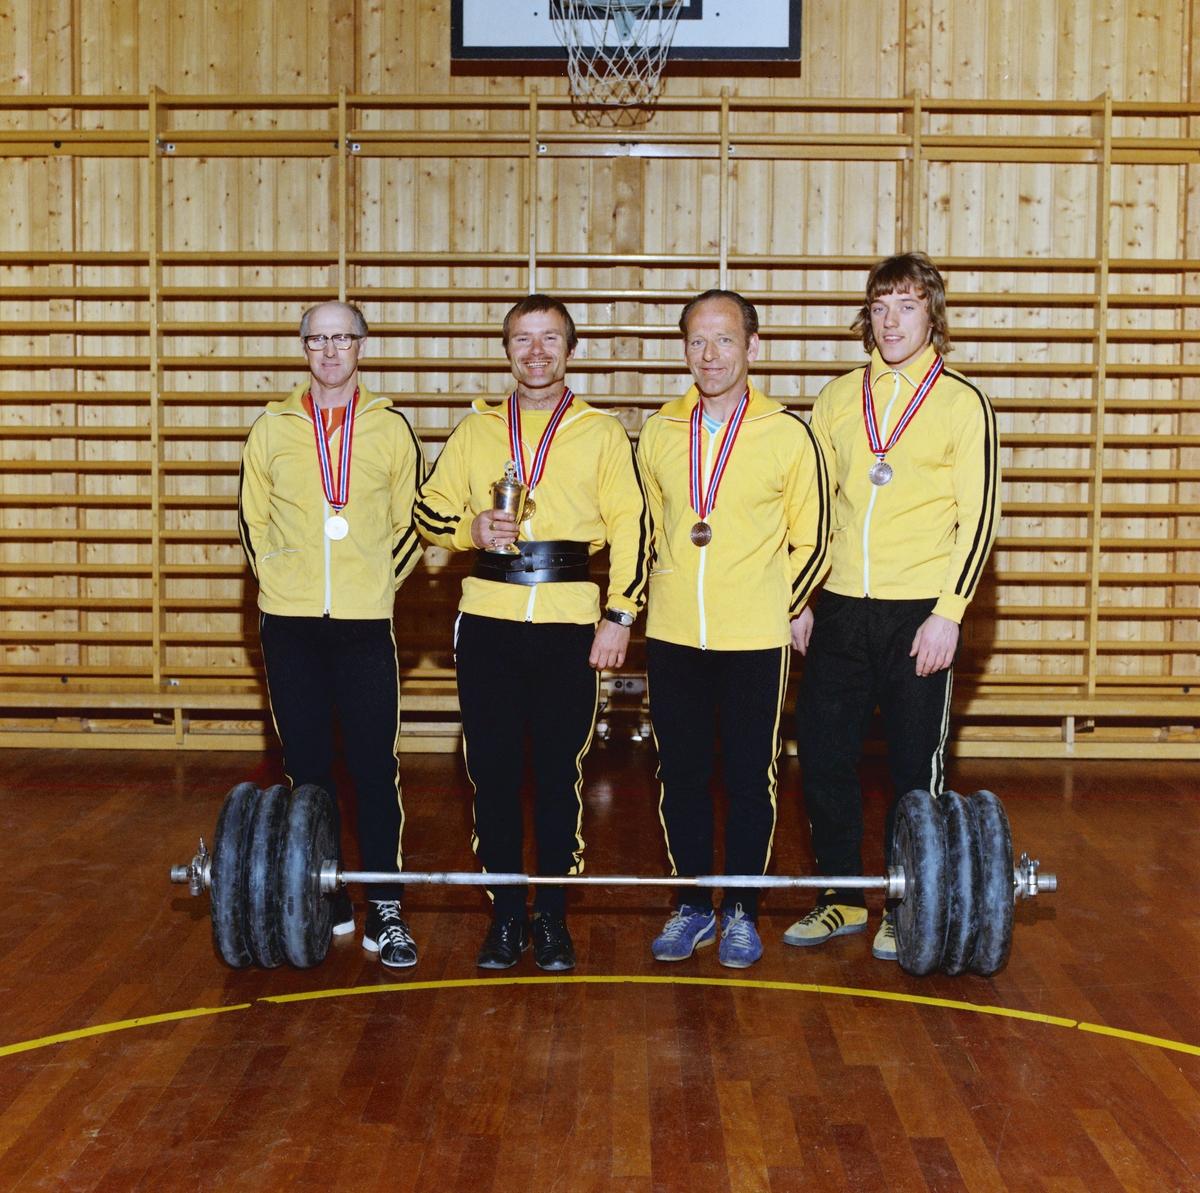 Vektløftere i J.L. Kraftsport i Lillestrøm